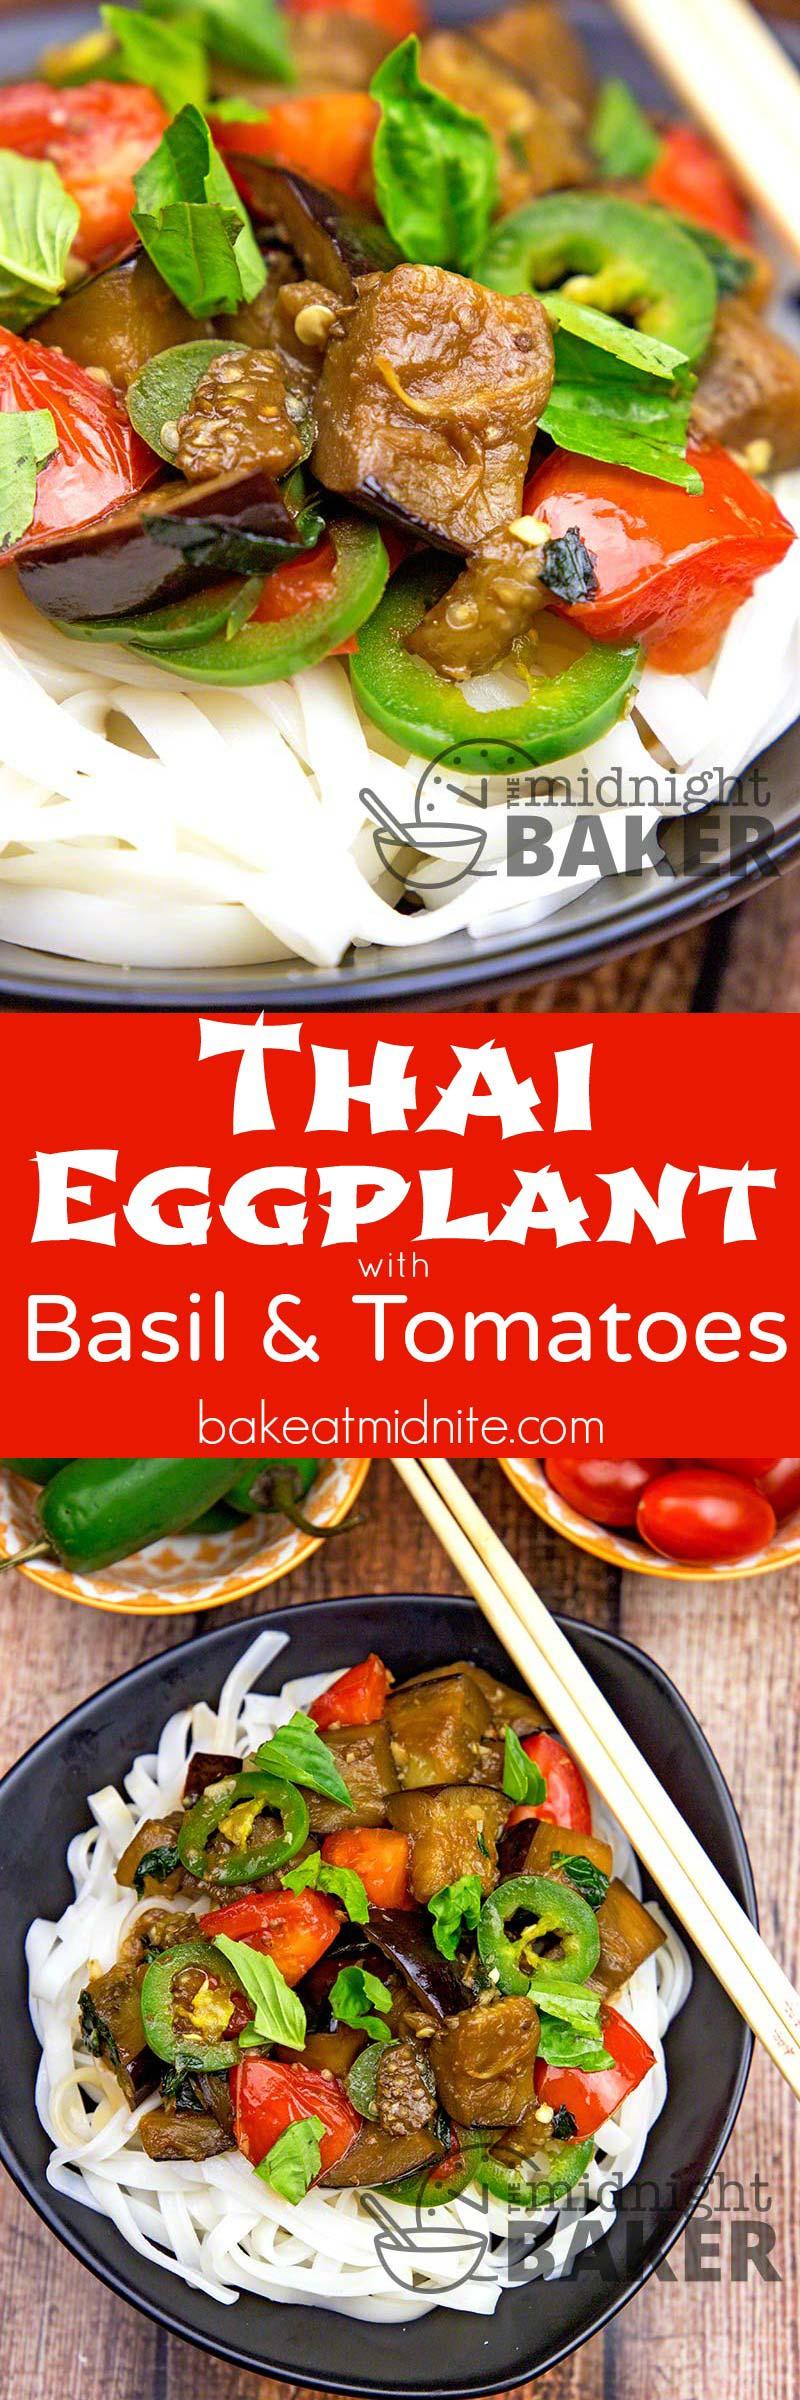 The Thai version of eggplant ratatouille! Light and delicious!